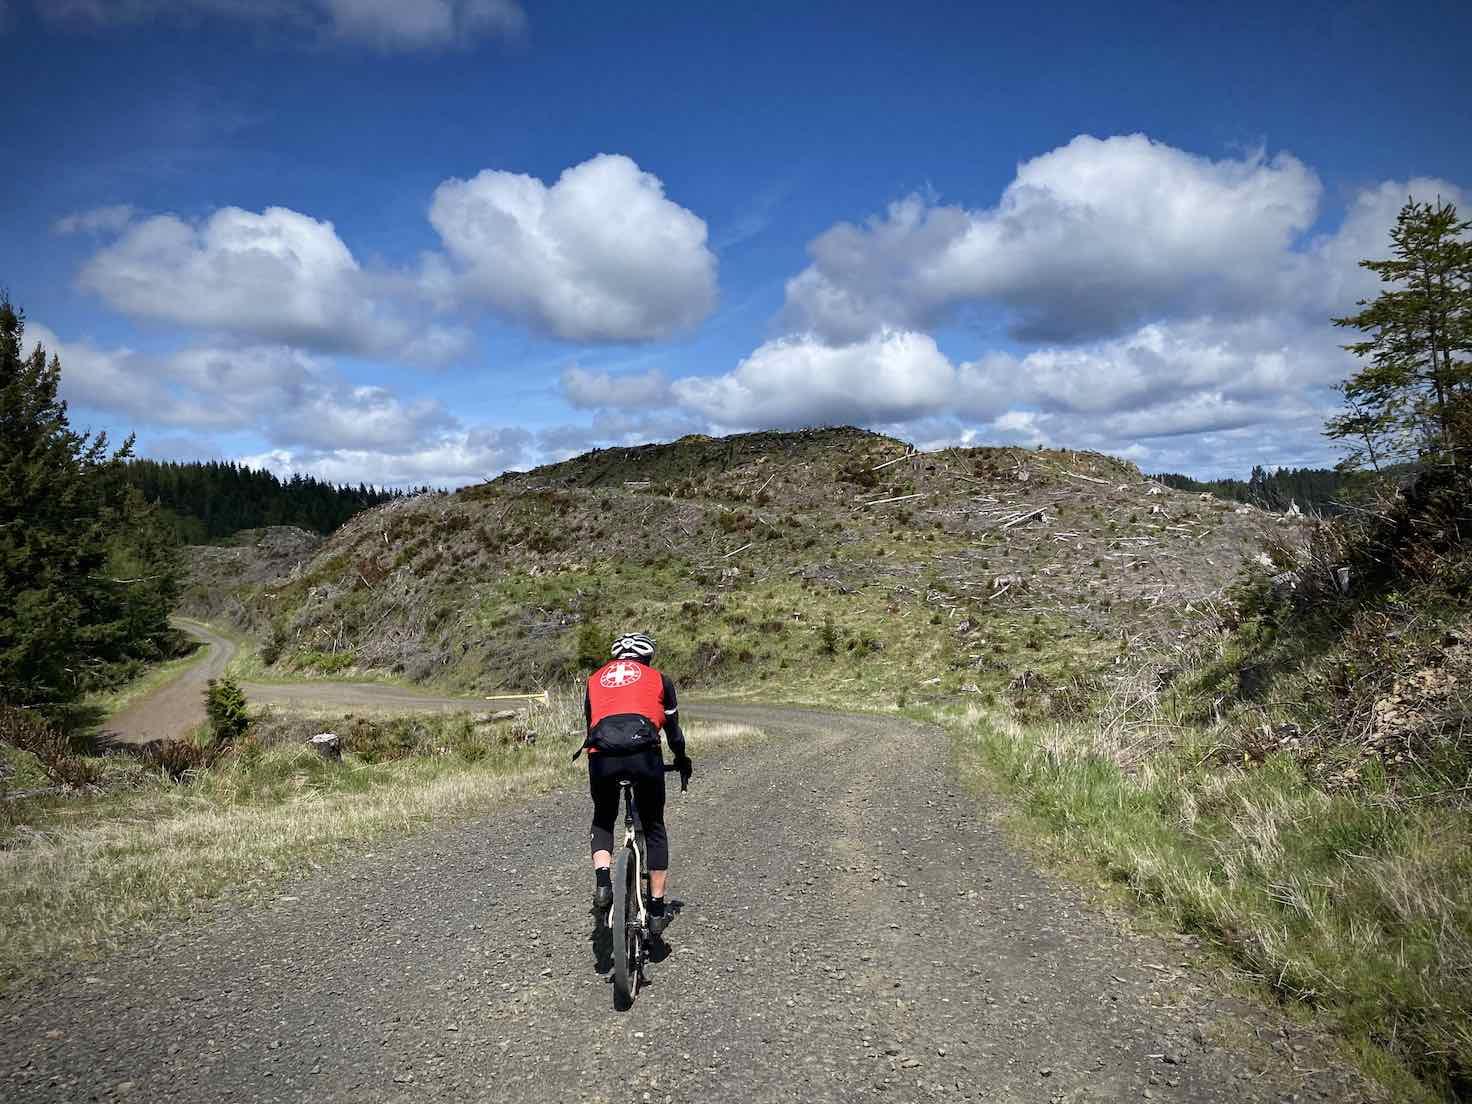 Gravel cyclists descending a rugged Weyerhaeuser road in Oregon.